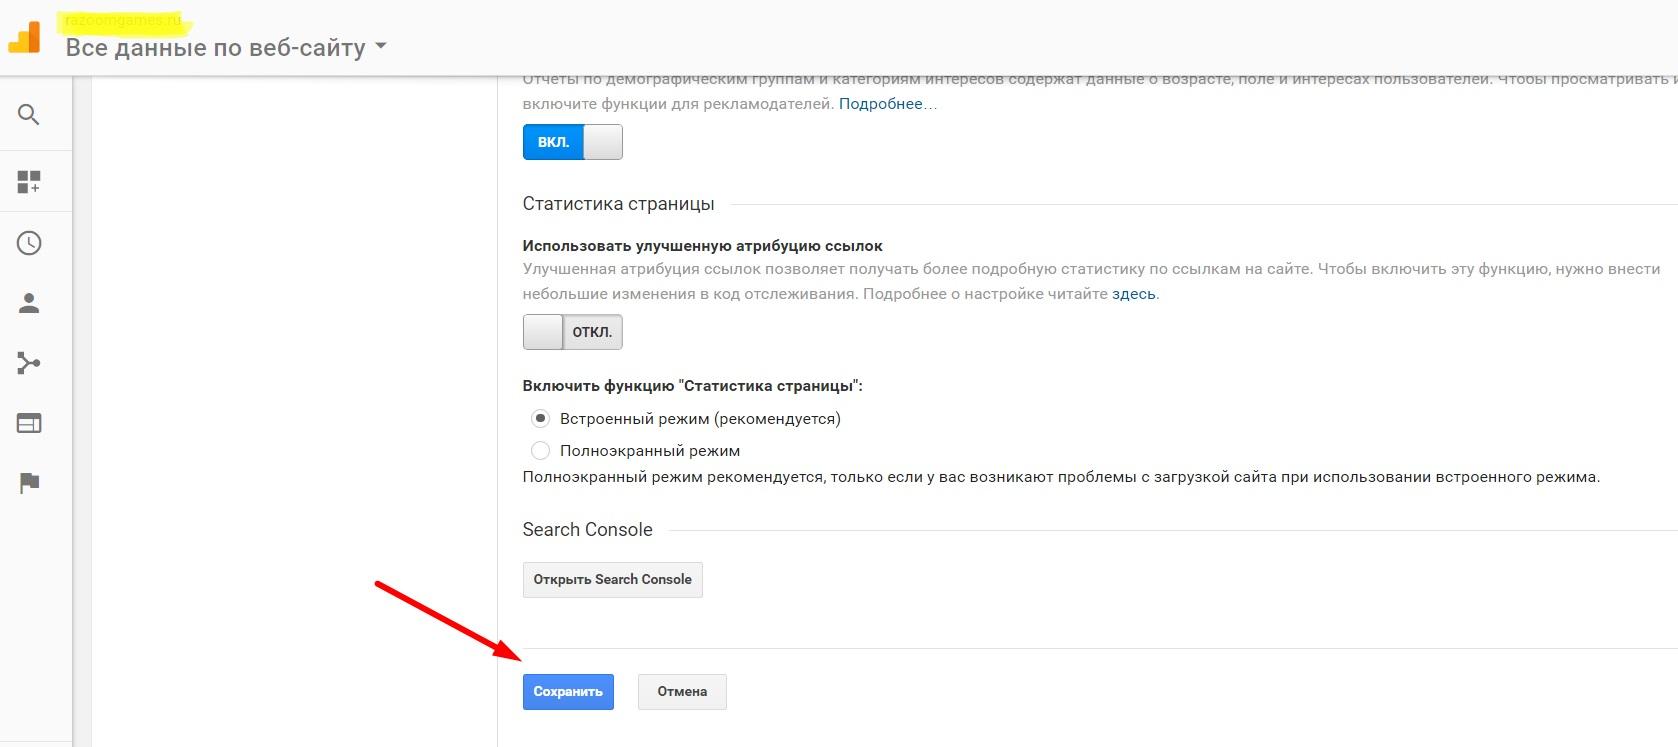 Разрешить пометку вручную Сохранить Гугл Аналитикс